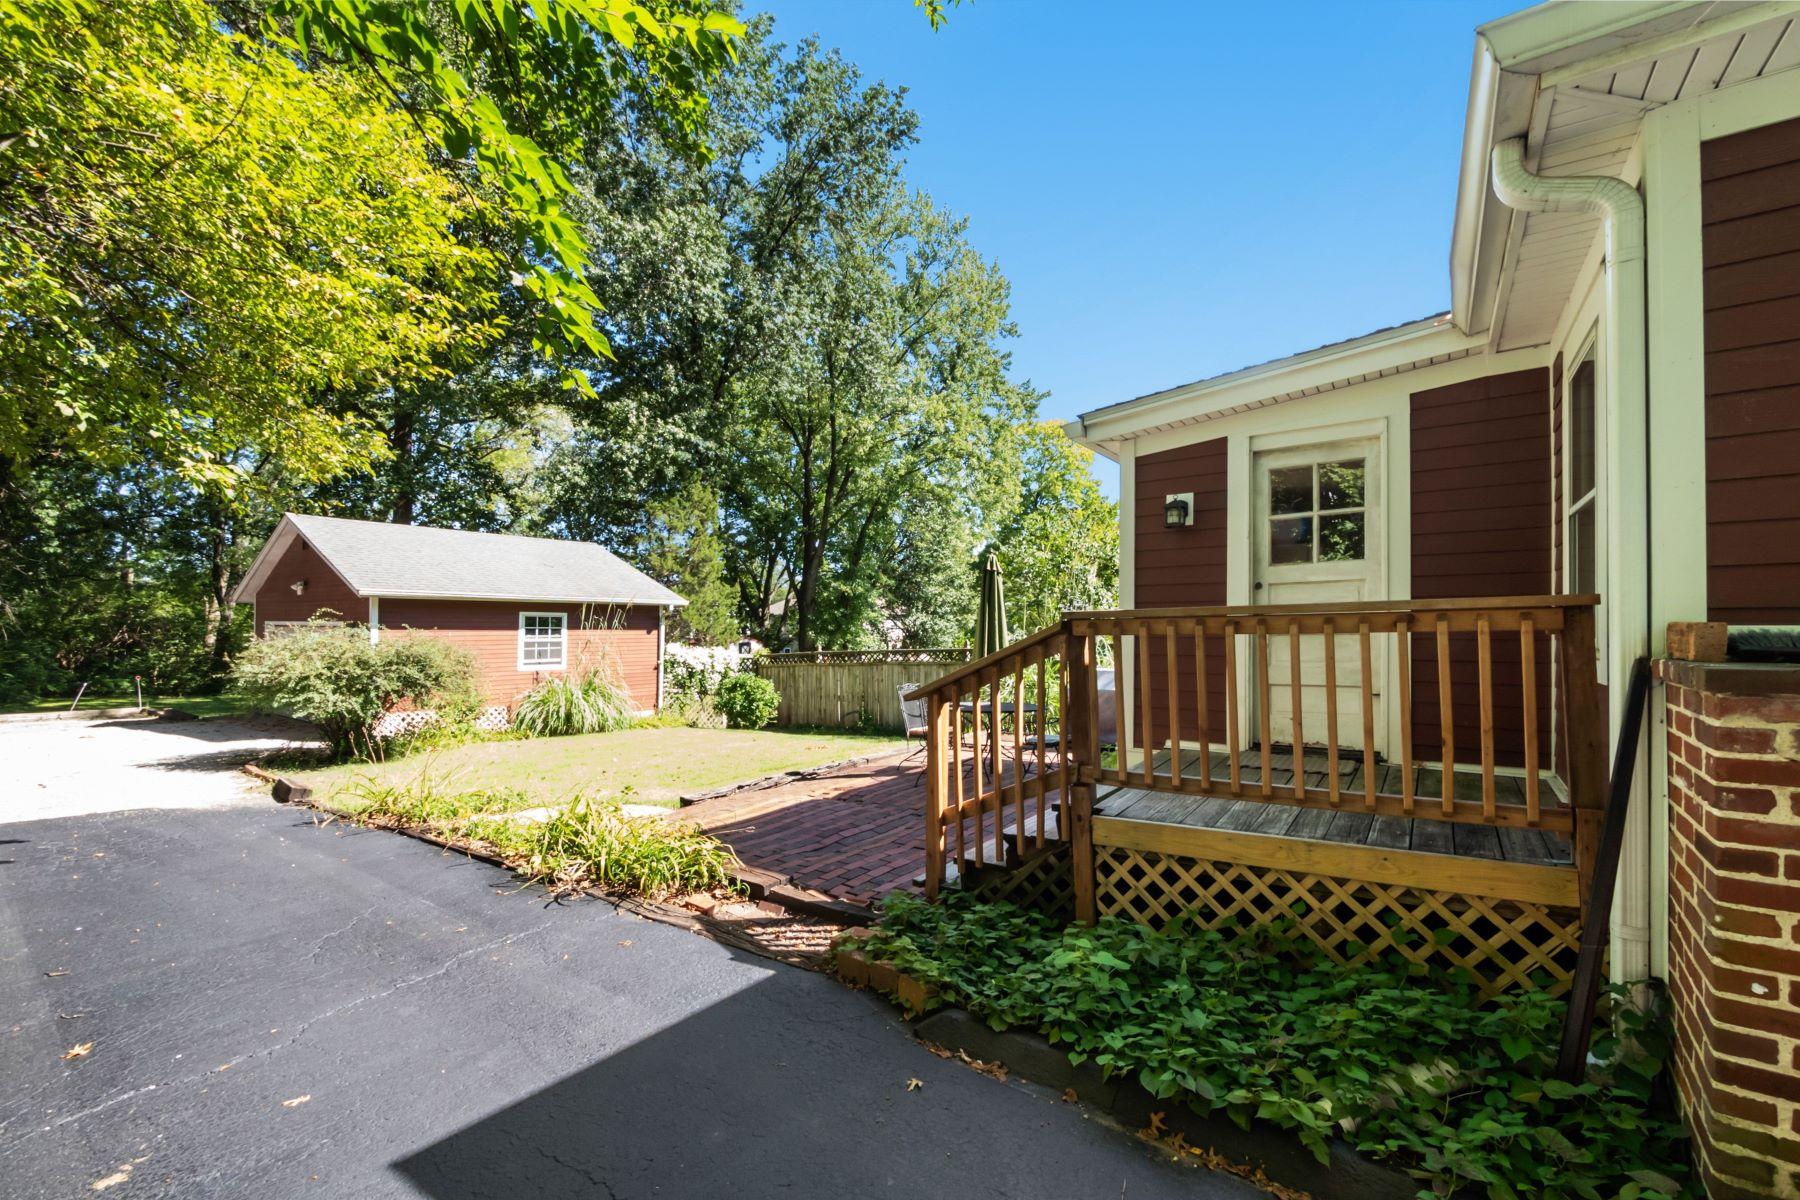 Additional photo for property listing at Olivette Farmhouse 820 North Price Road, Olivette, Μιζουρι 63132 Ηνωμένες Πολιτείες